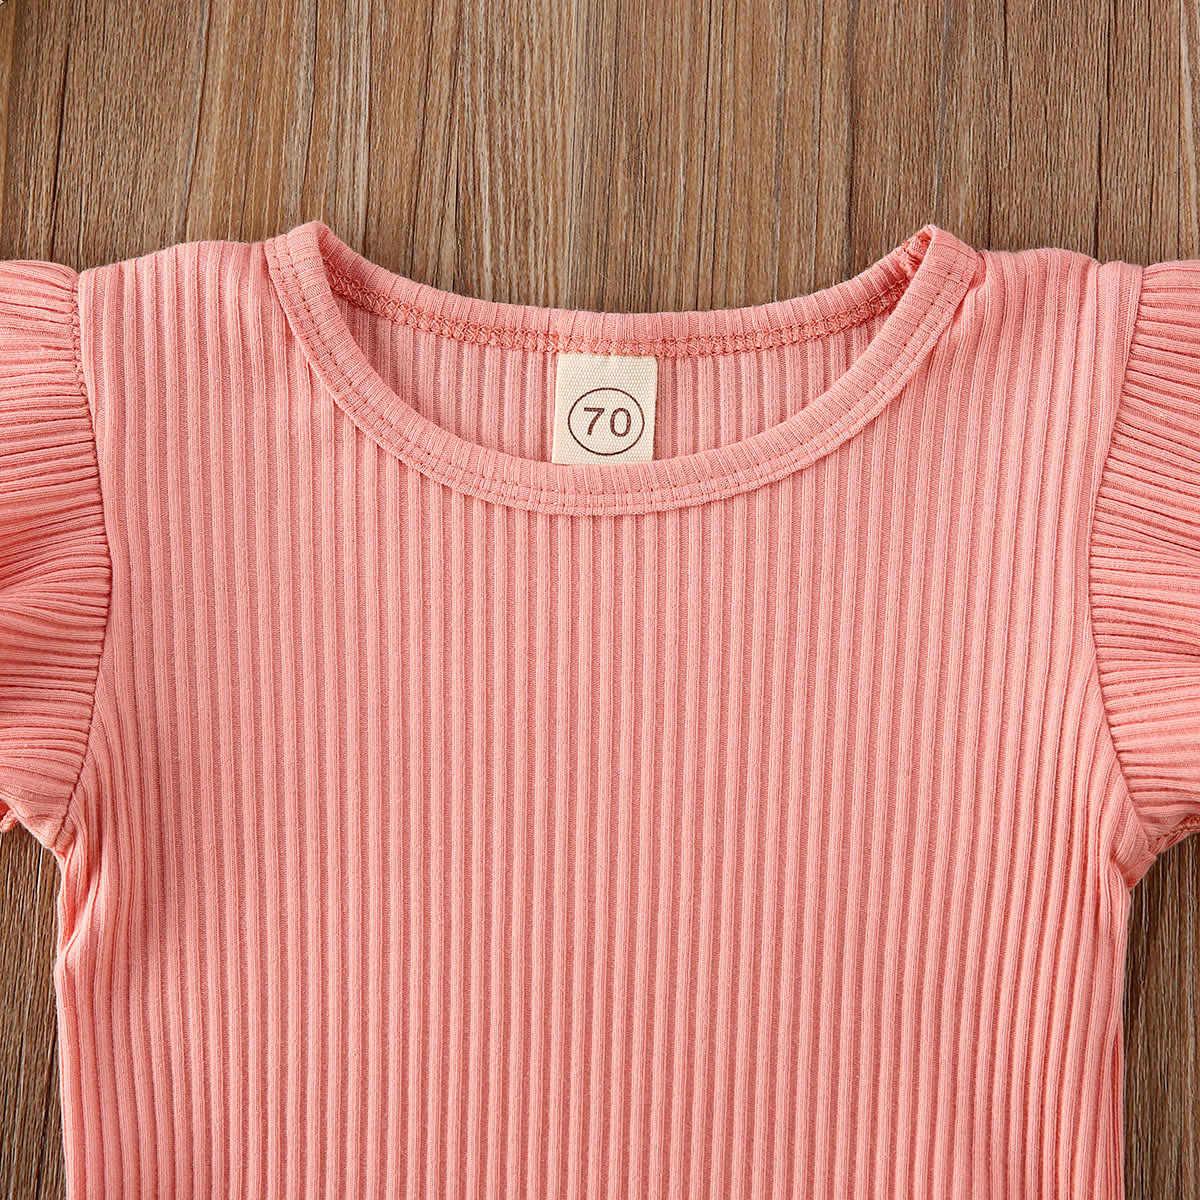 2020 Baby Summer Clothing Infant Newborn Baby Girl Ruffled Ribbed Bodysuit Floral Shorts Headband 3Pcs Set